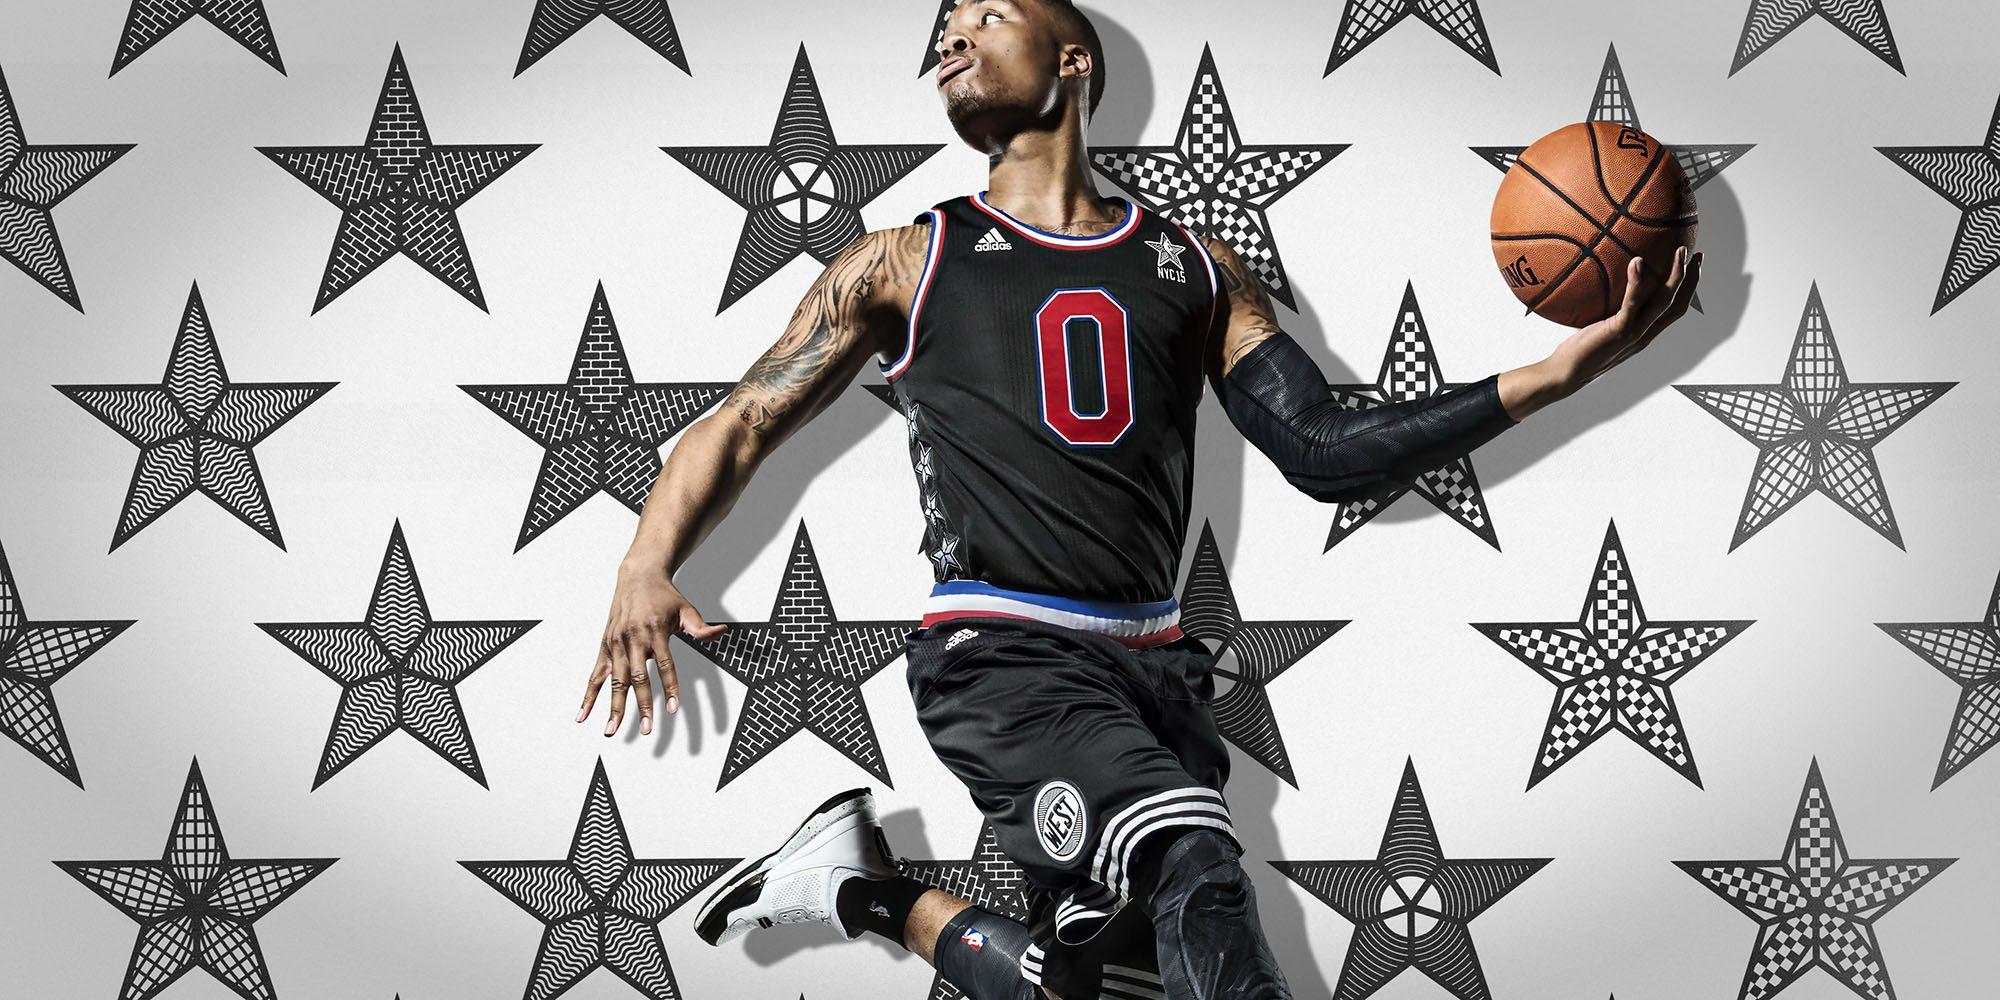 adidas Damian Lillard NBA All-Star 2015 1 H